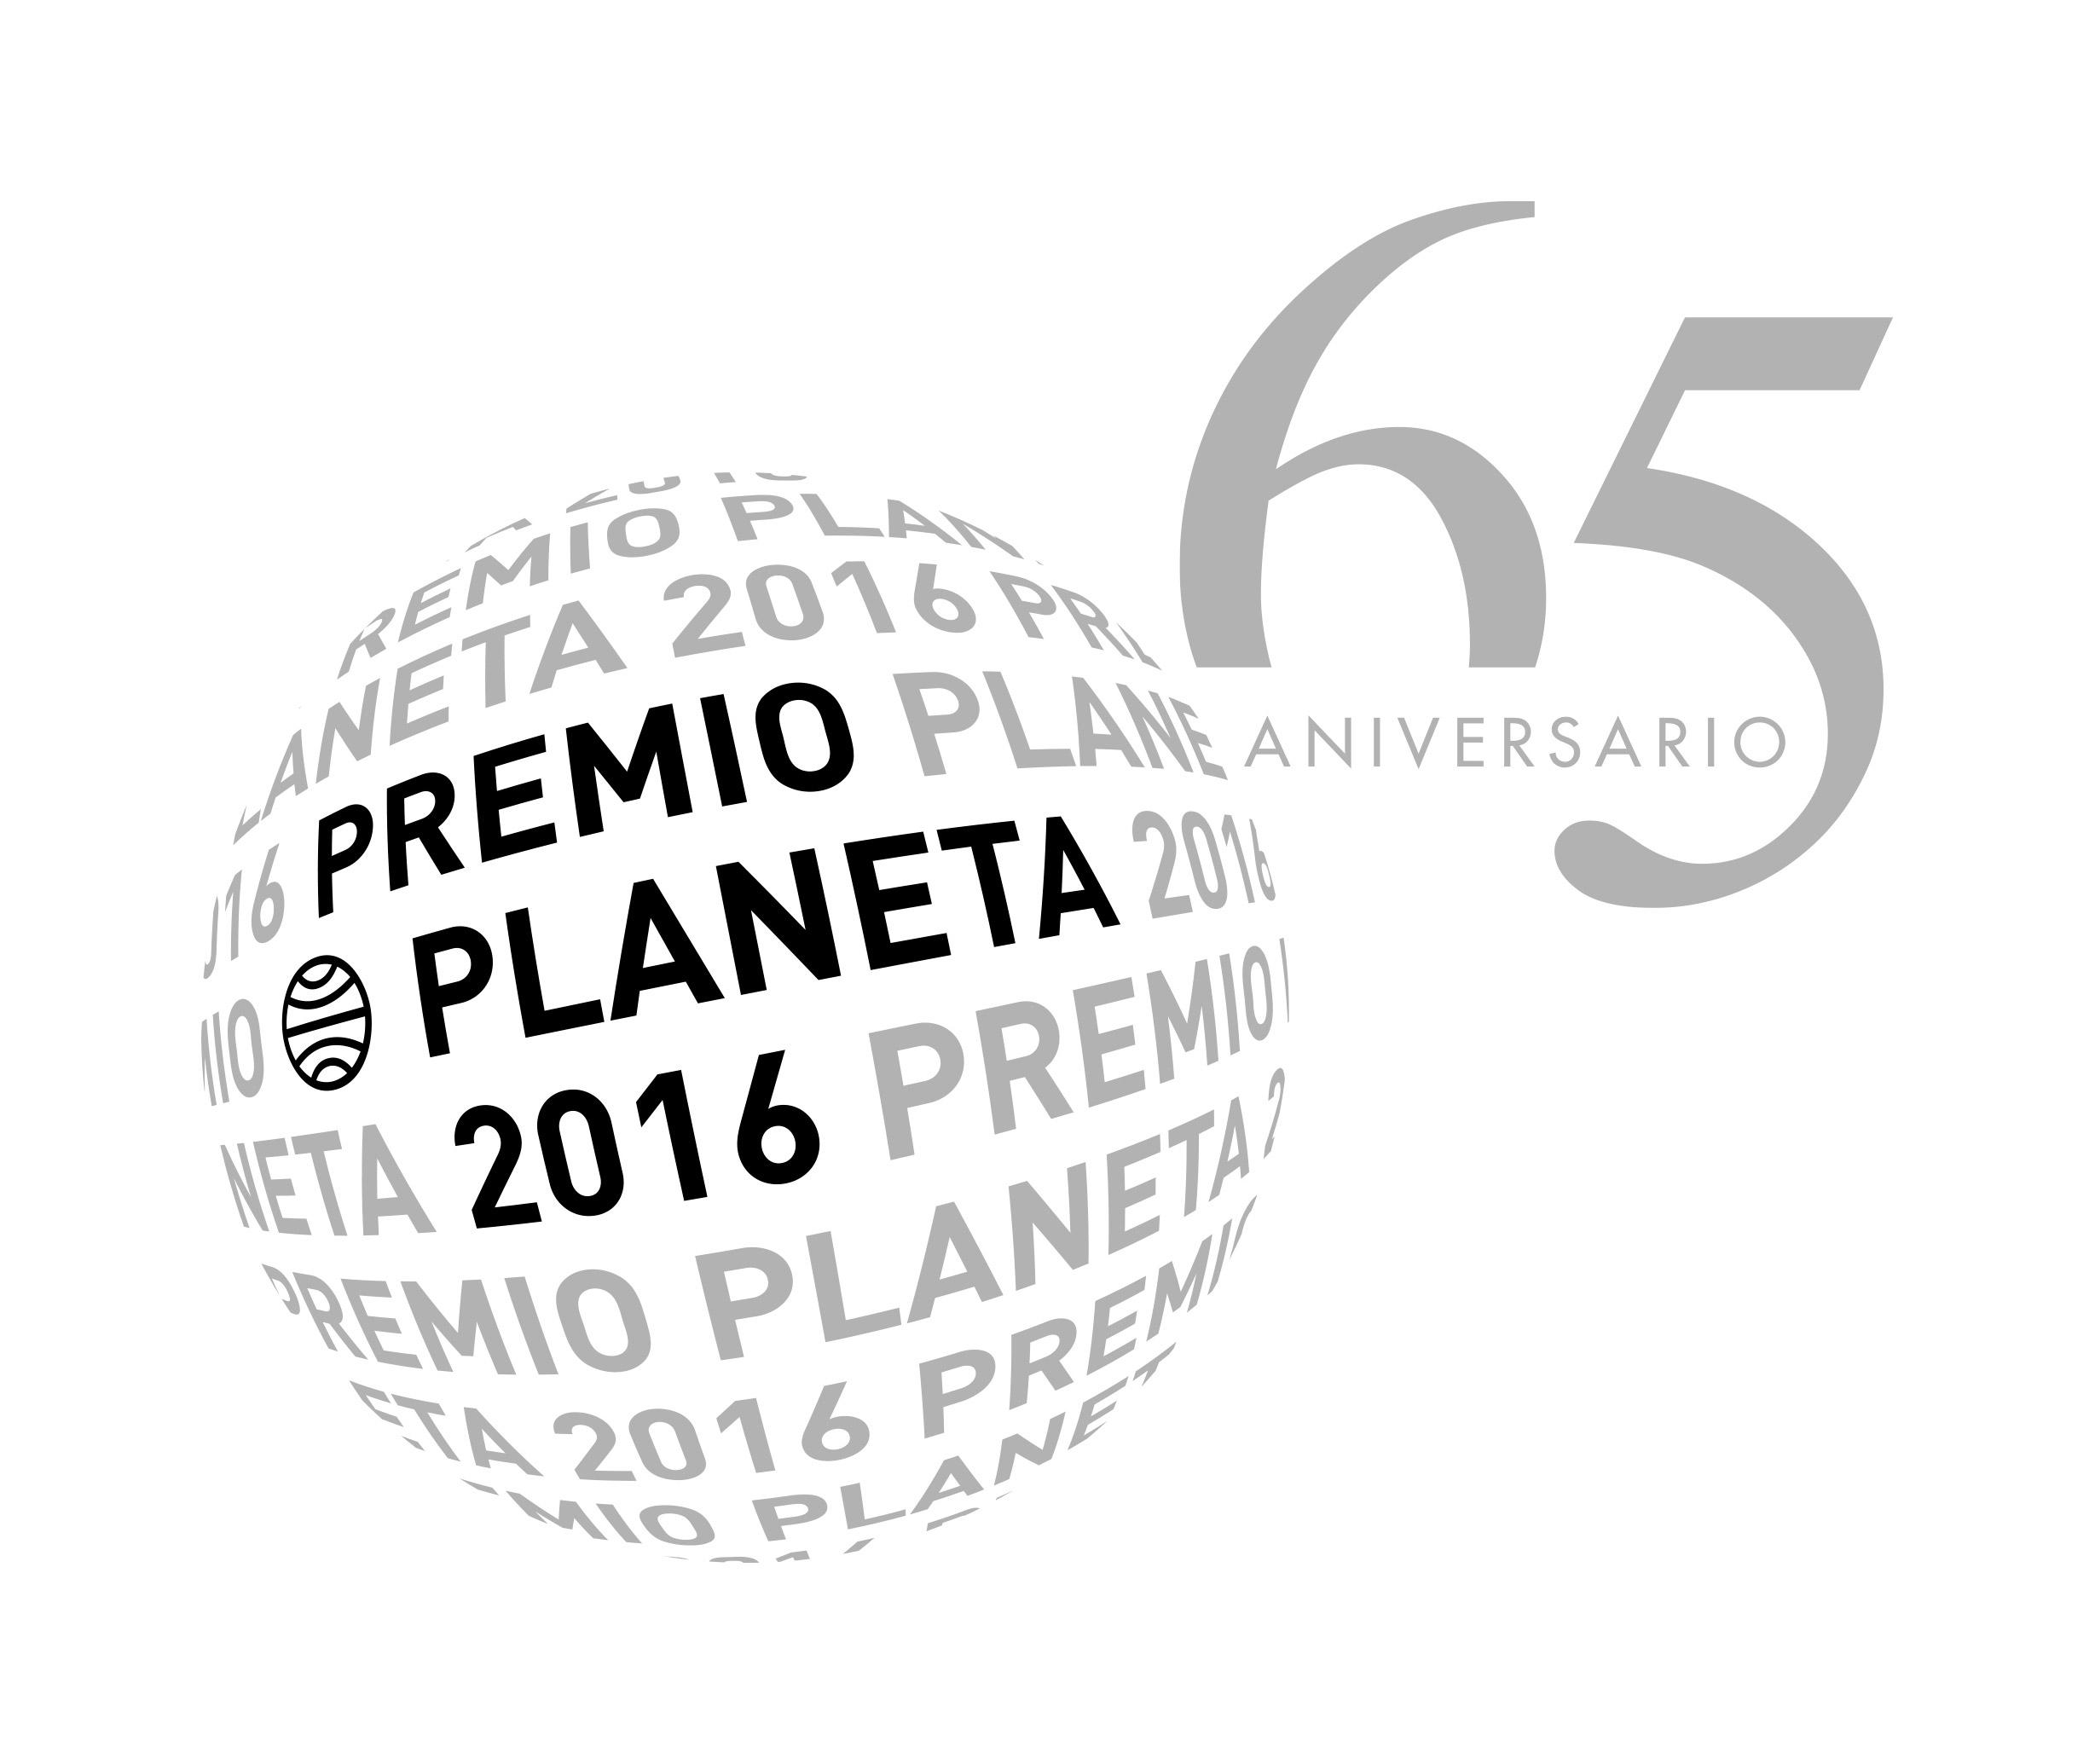 Resultado de imagen de premio planeta 2016